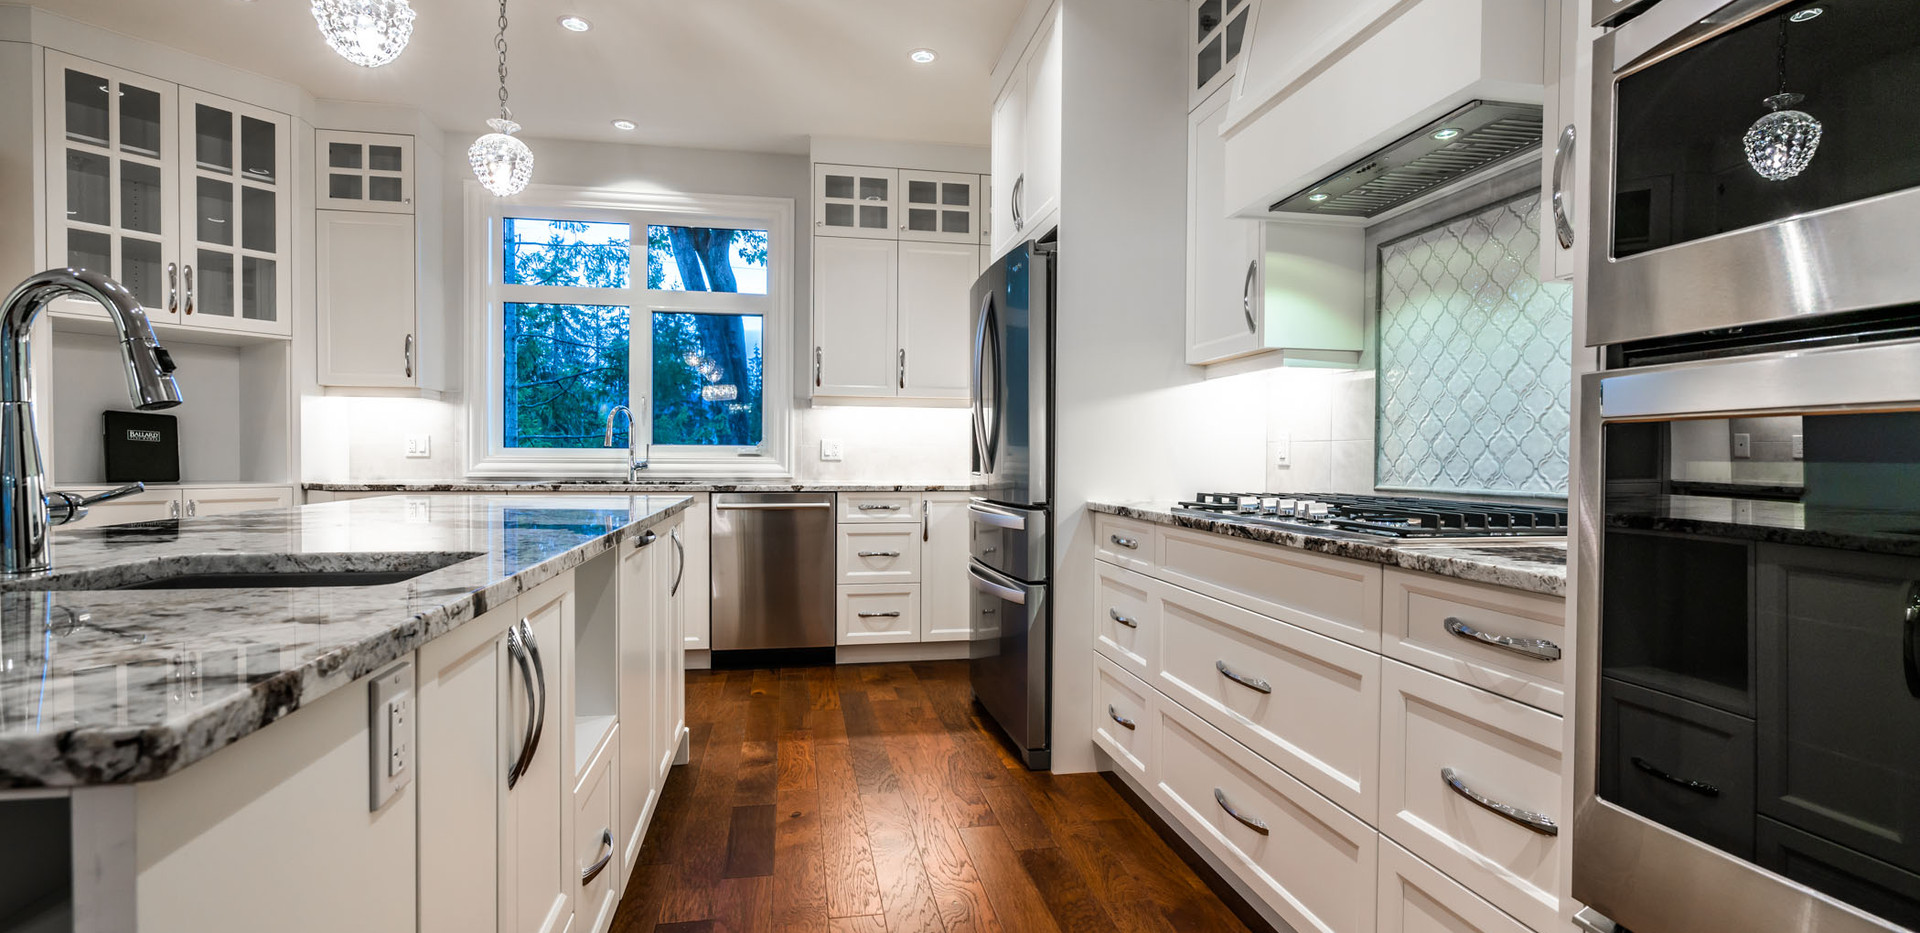 2847 Ashcraft Main House Kitchen2.jpg